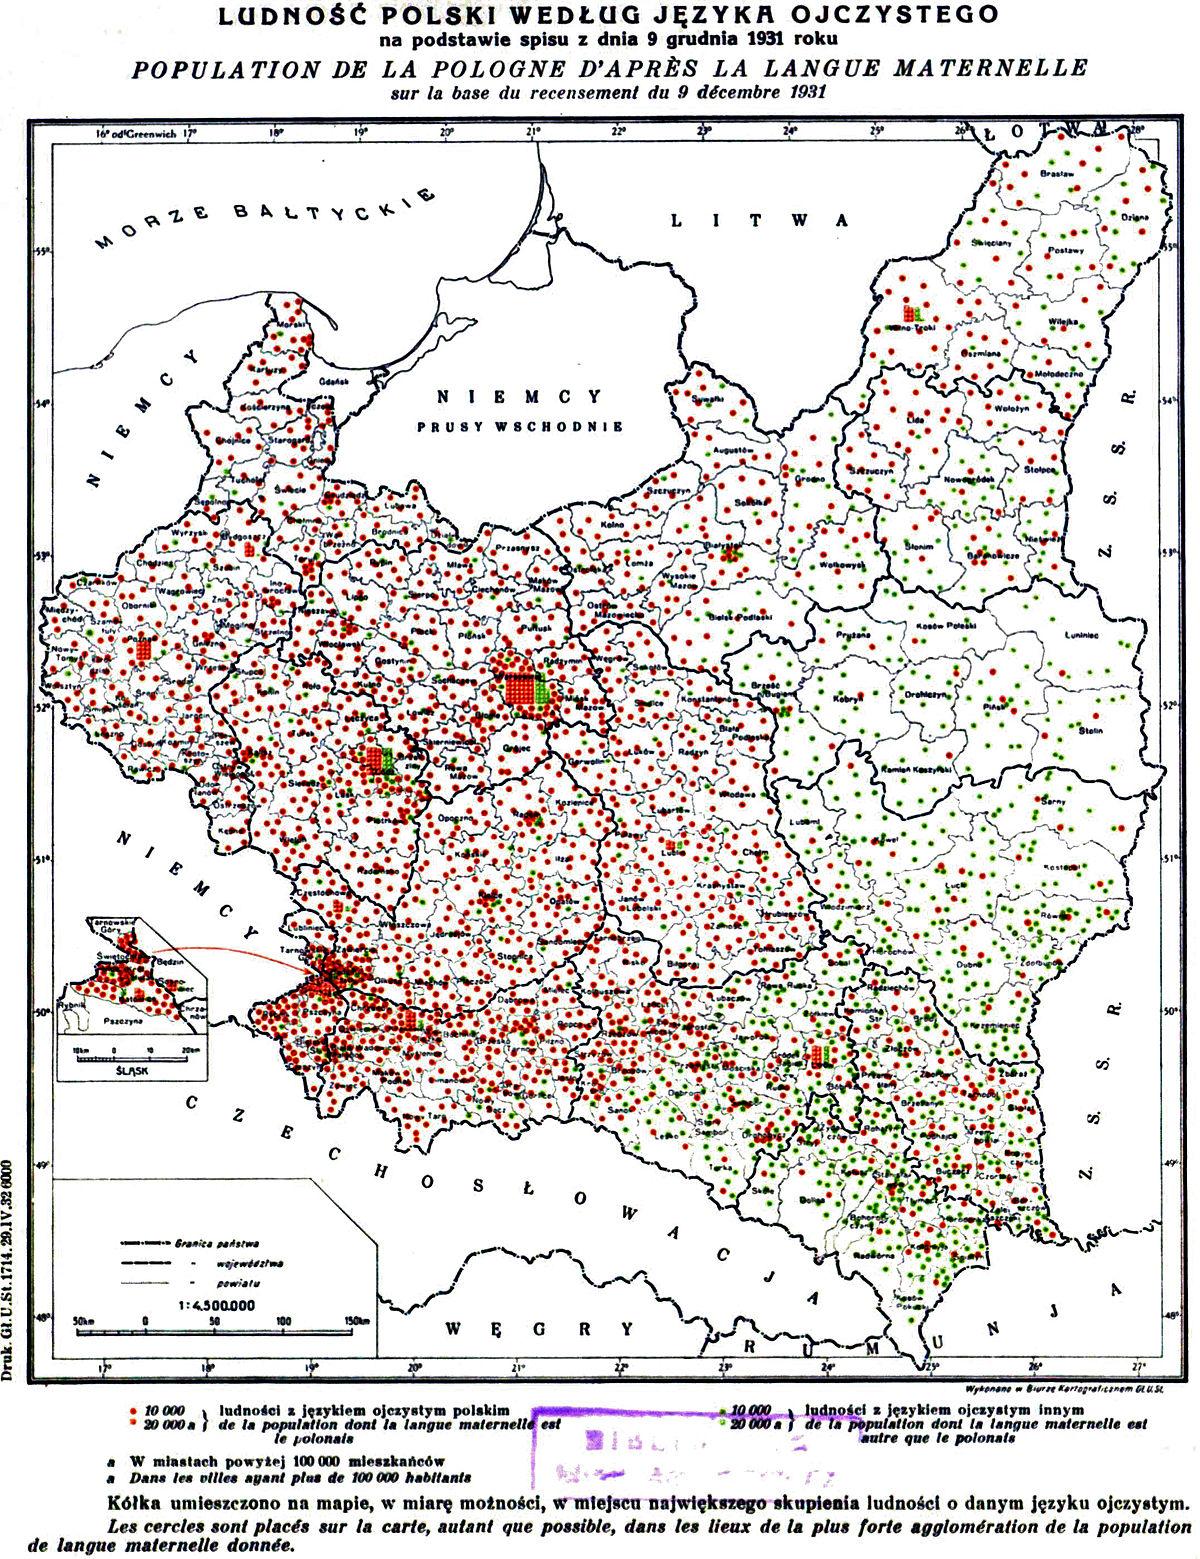 Polish census of 193